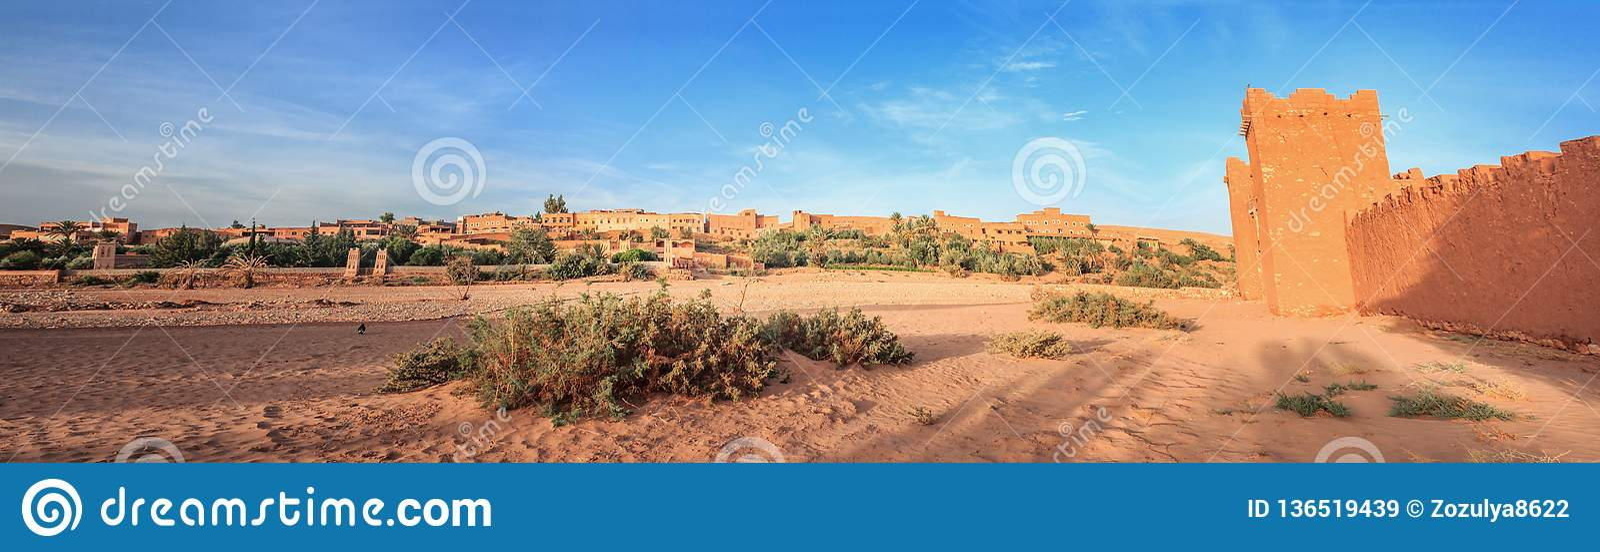 Eingang von ksar Ait Benhaddou, Ouarzazate Alte Lehmstadt in Marokko